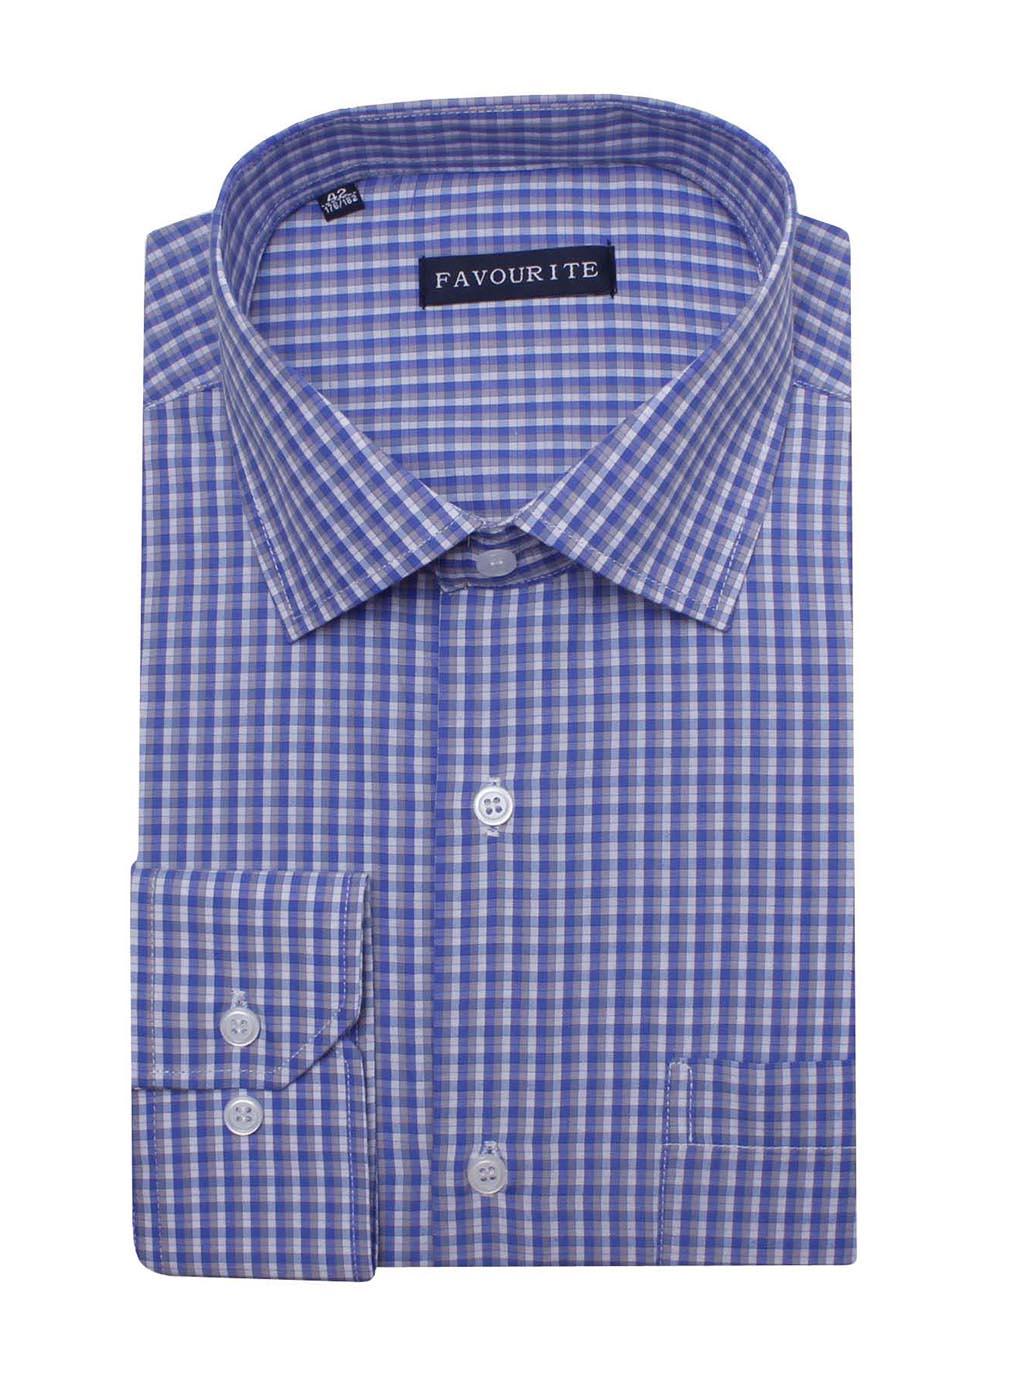 Рубашка мужская 07, Favourite фото